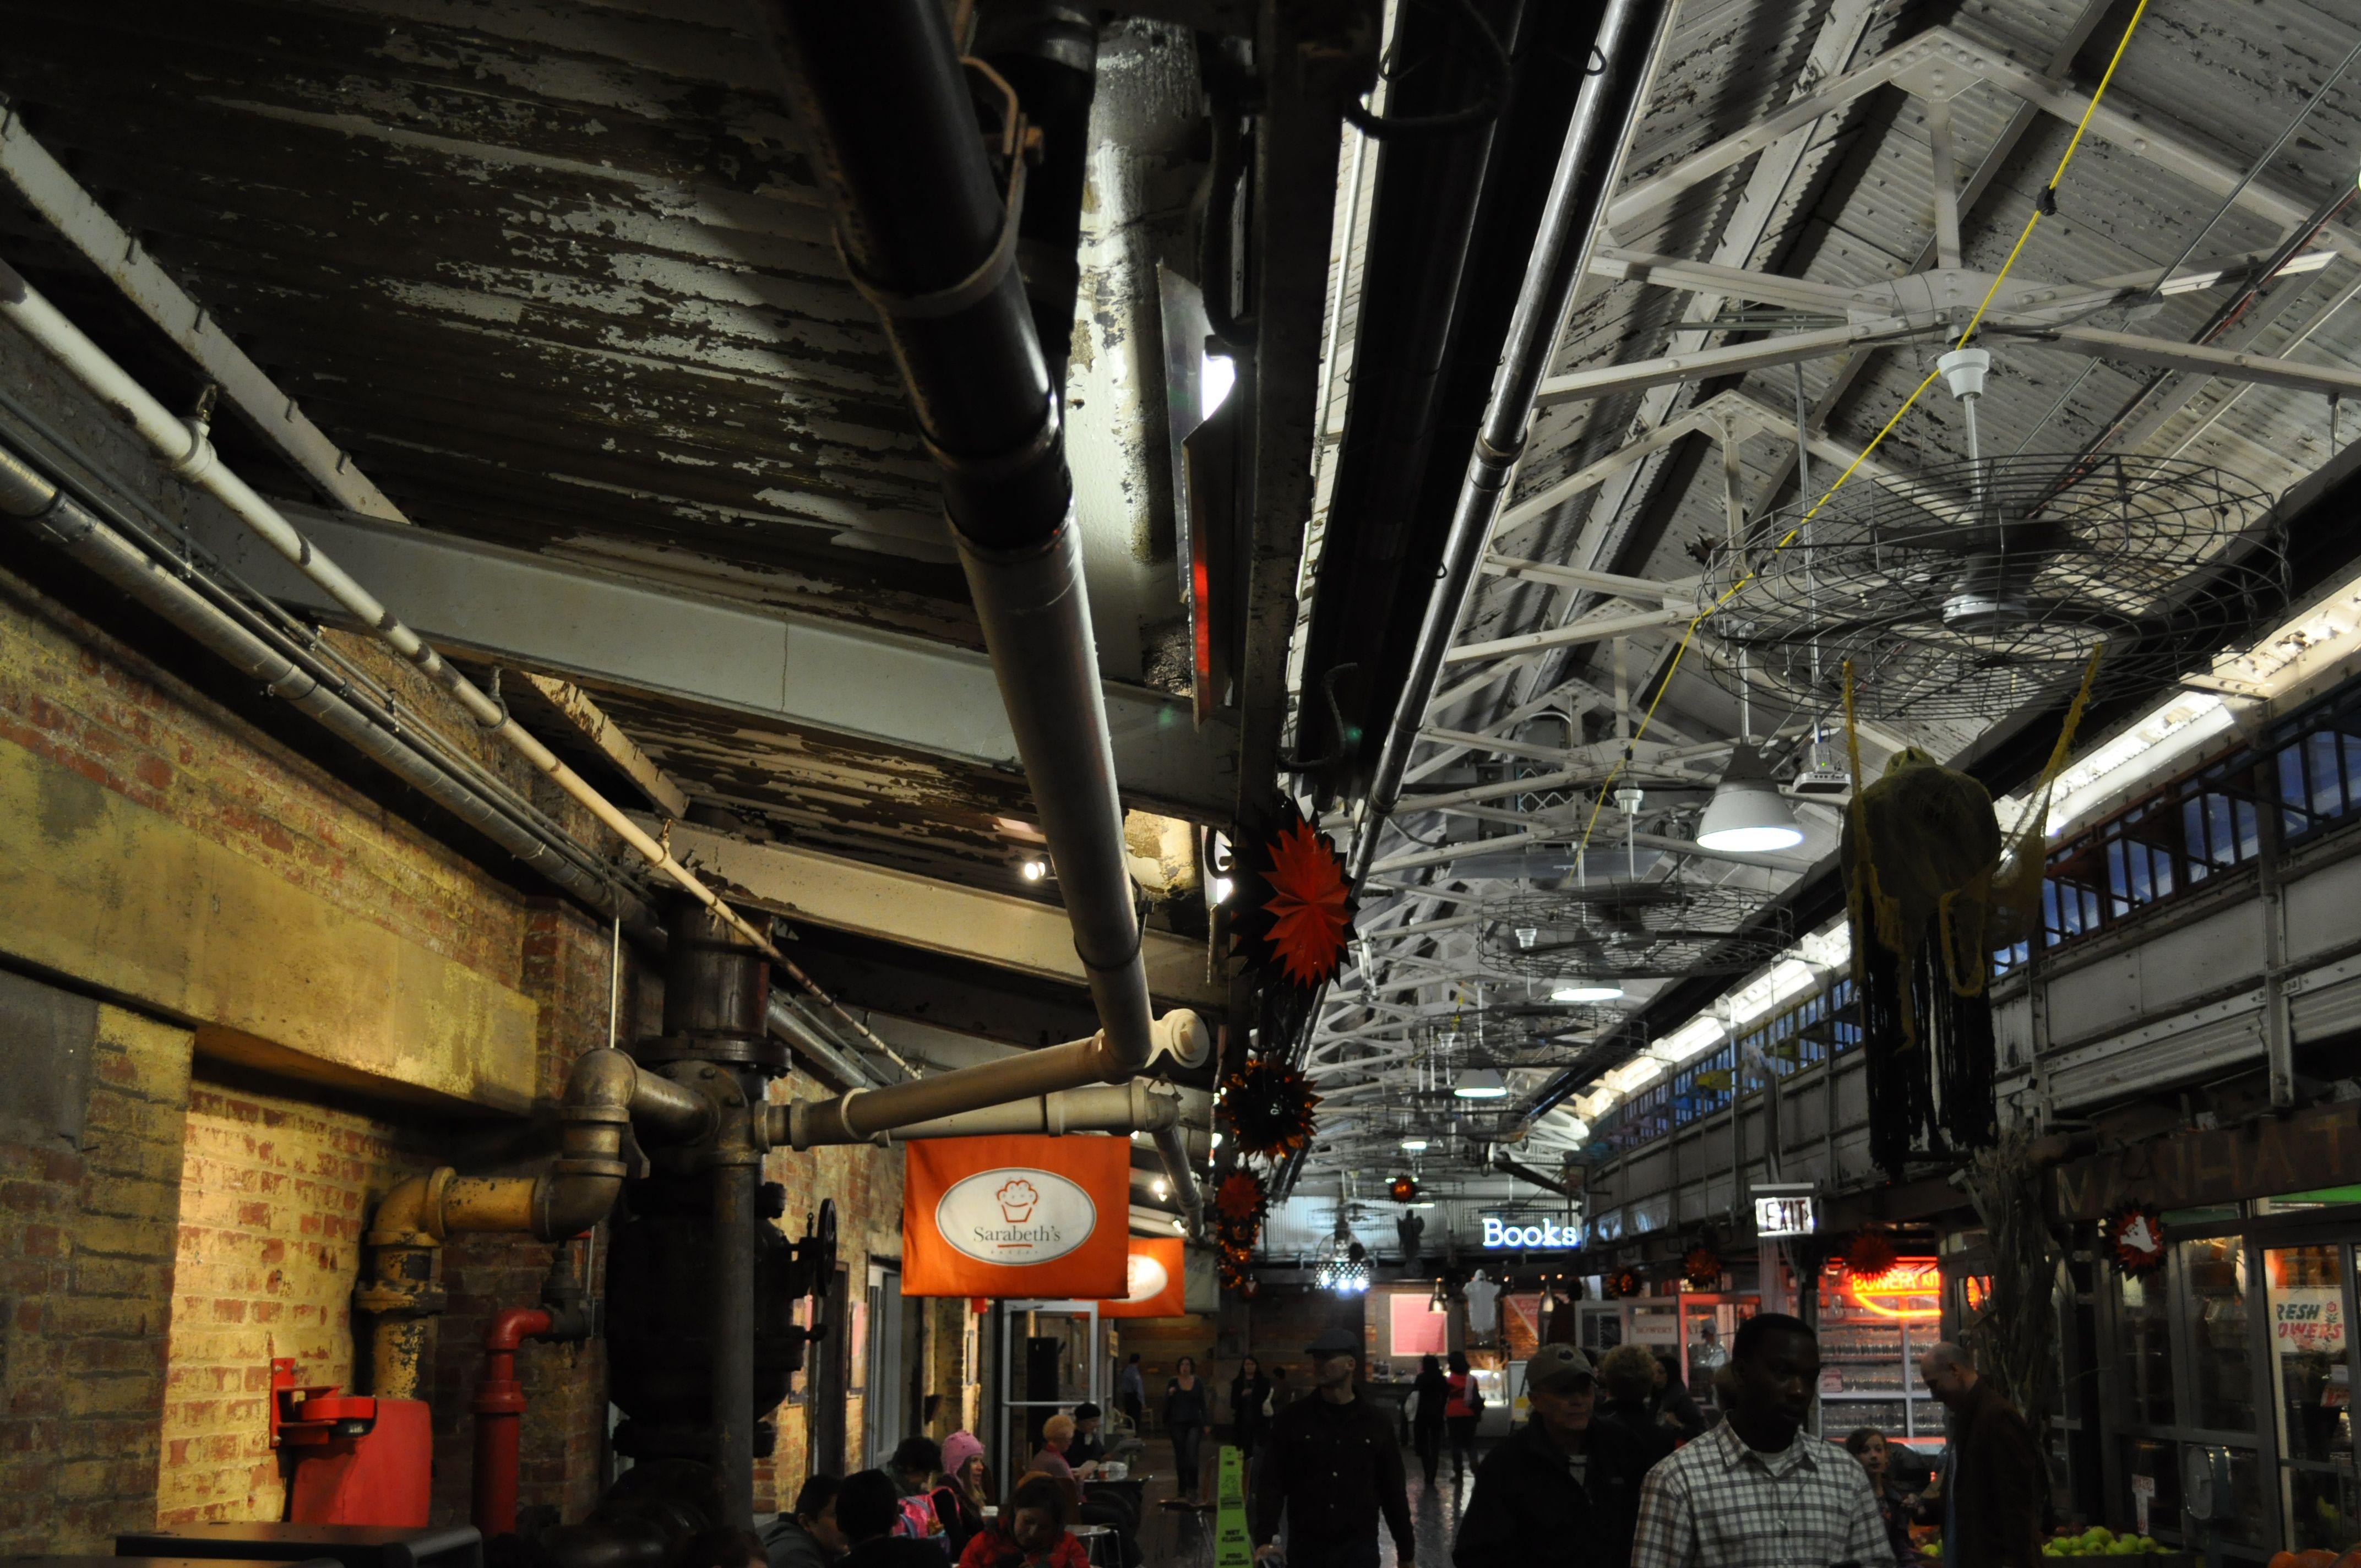 Chelsea Market - Architectural Hardware